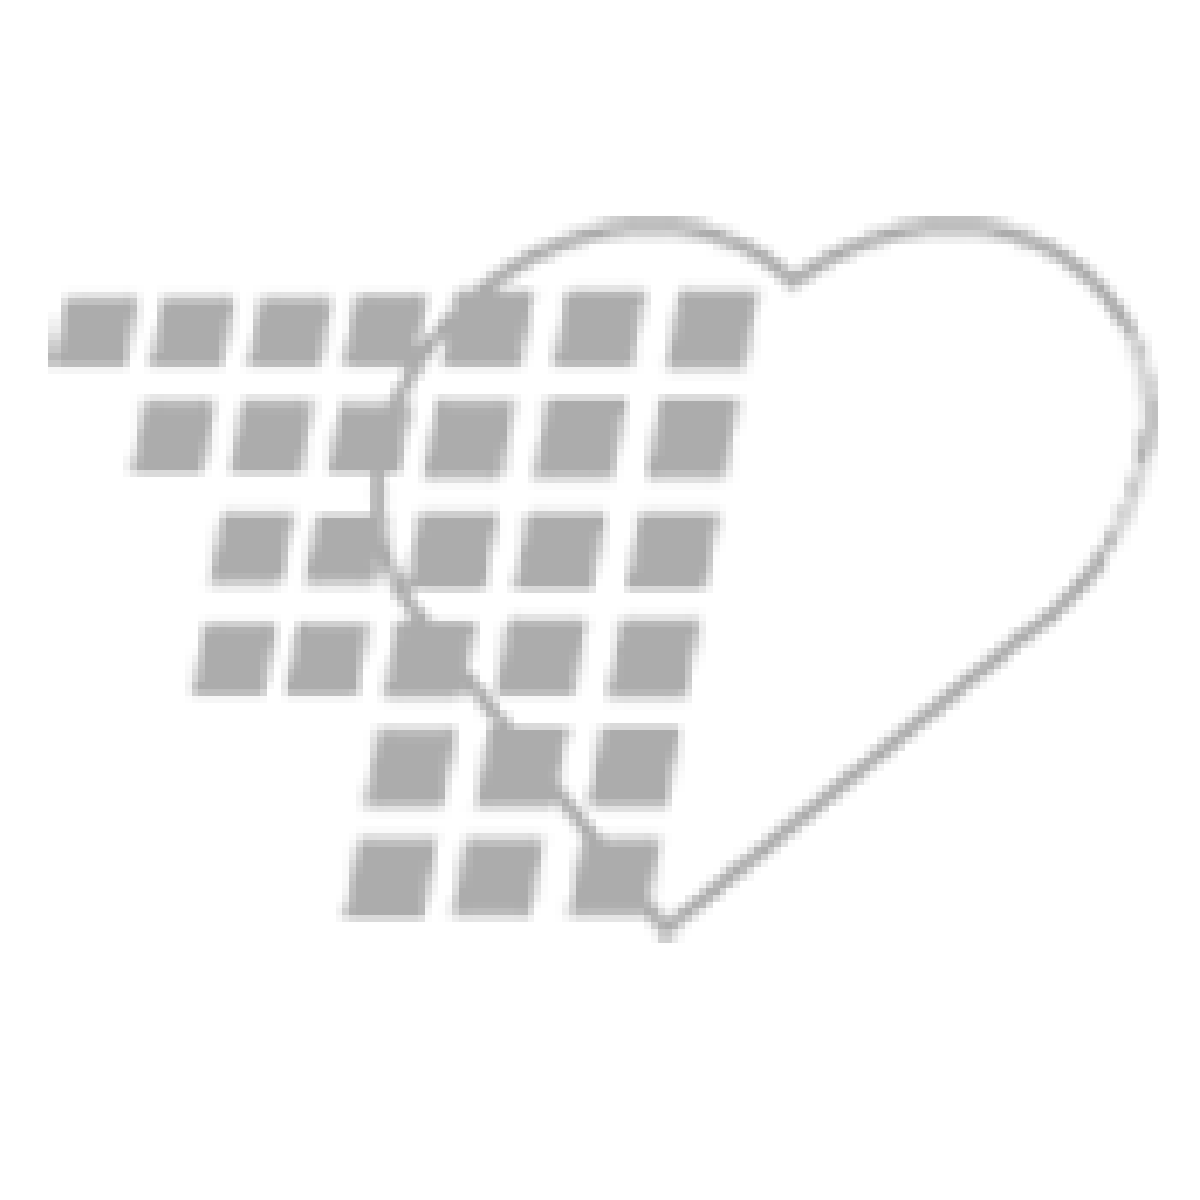 09-31-1001 Pocket Nurse® Laminated Respiratory Inhaler and Medications Poster